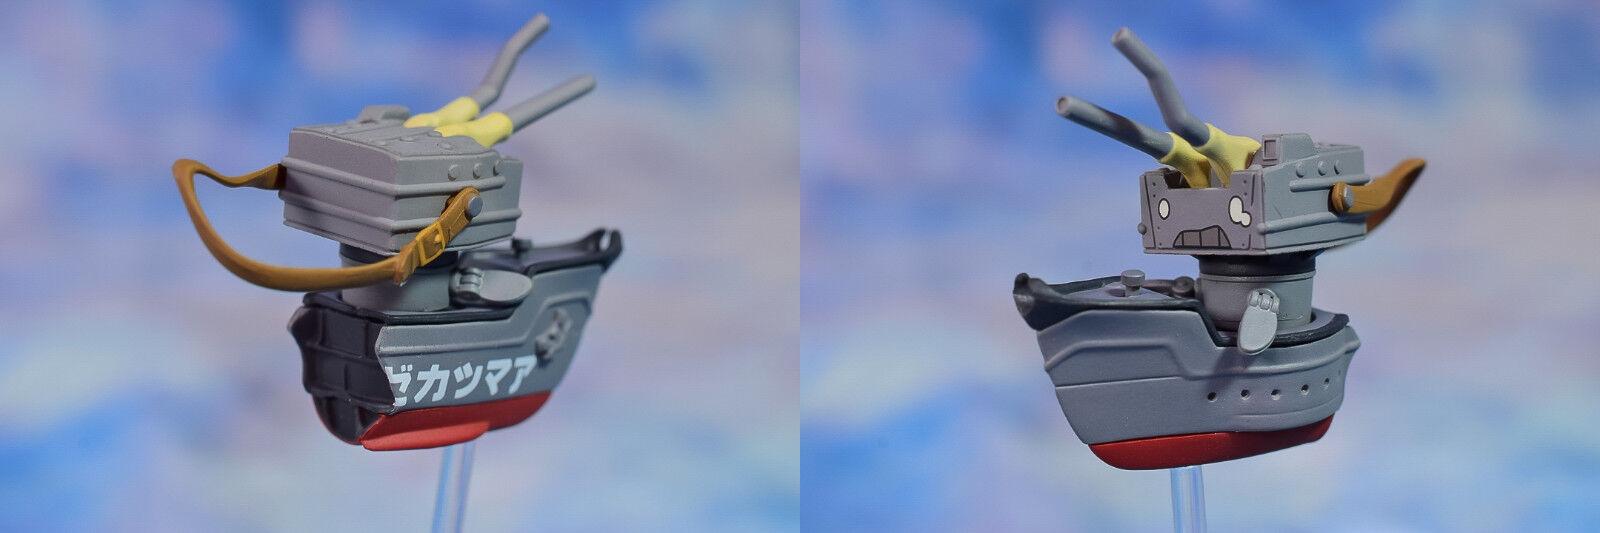 Figma KanColle  Amatsukaze Destroyer Destroyer Destroyer action figure genuine Max Factory figFIX 879e39